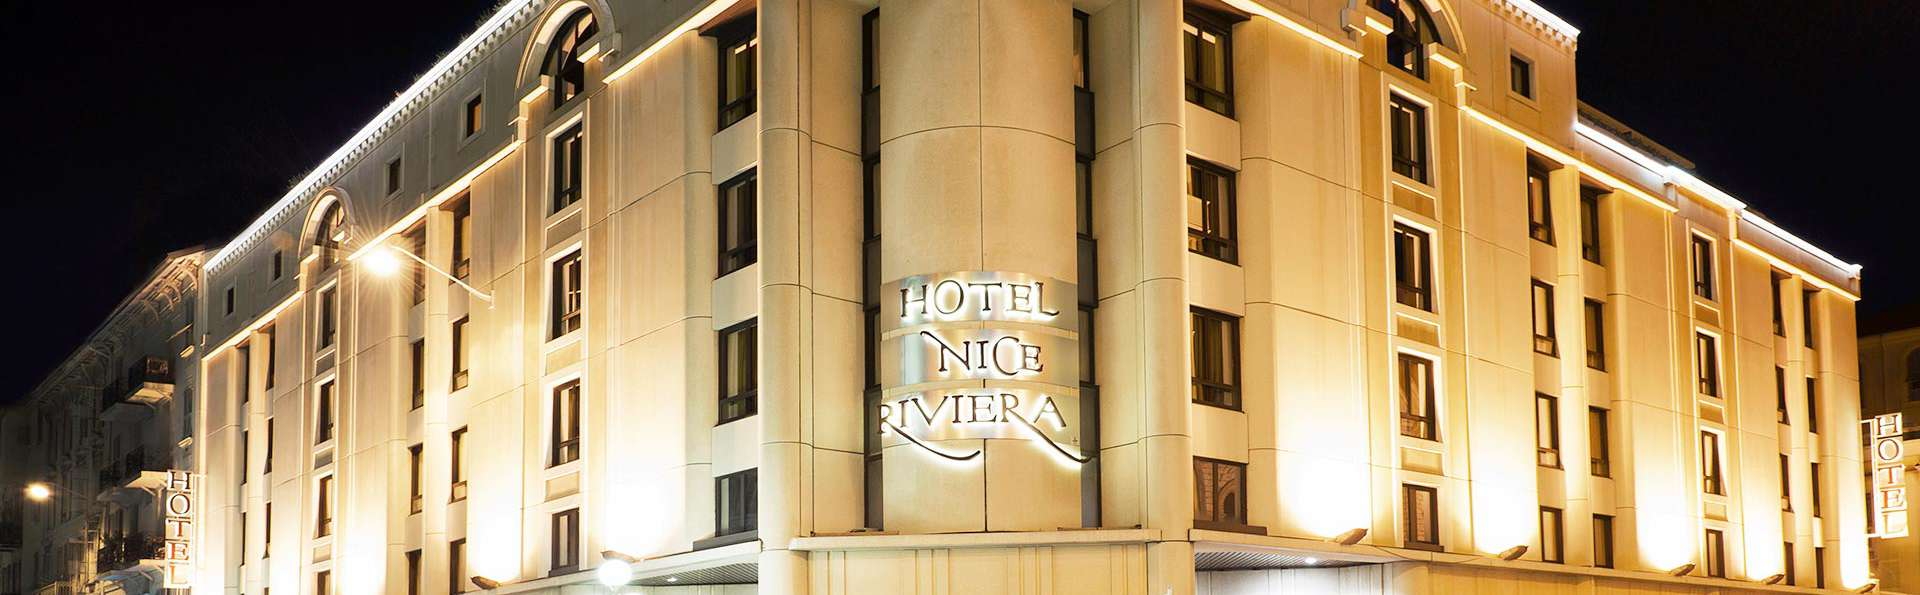 Hôtel Nice Riviera - EDIT_FRONT_01.jpg